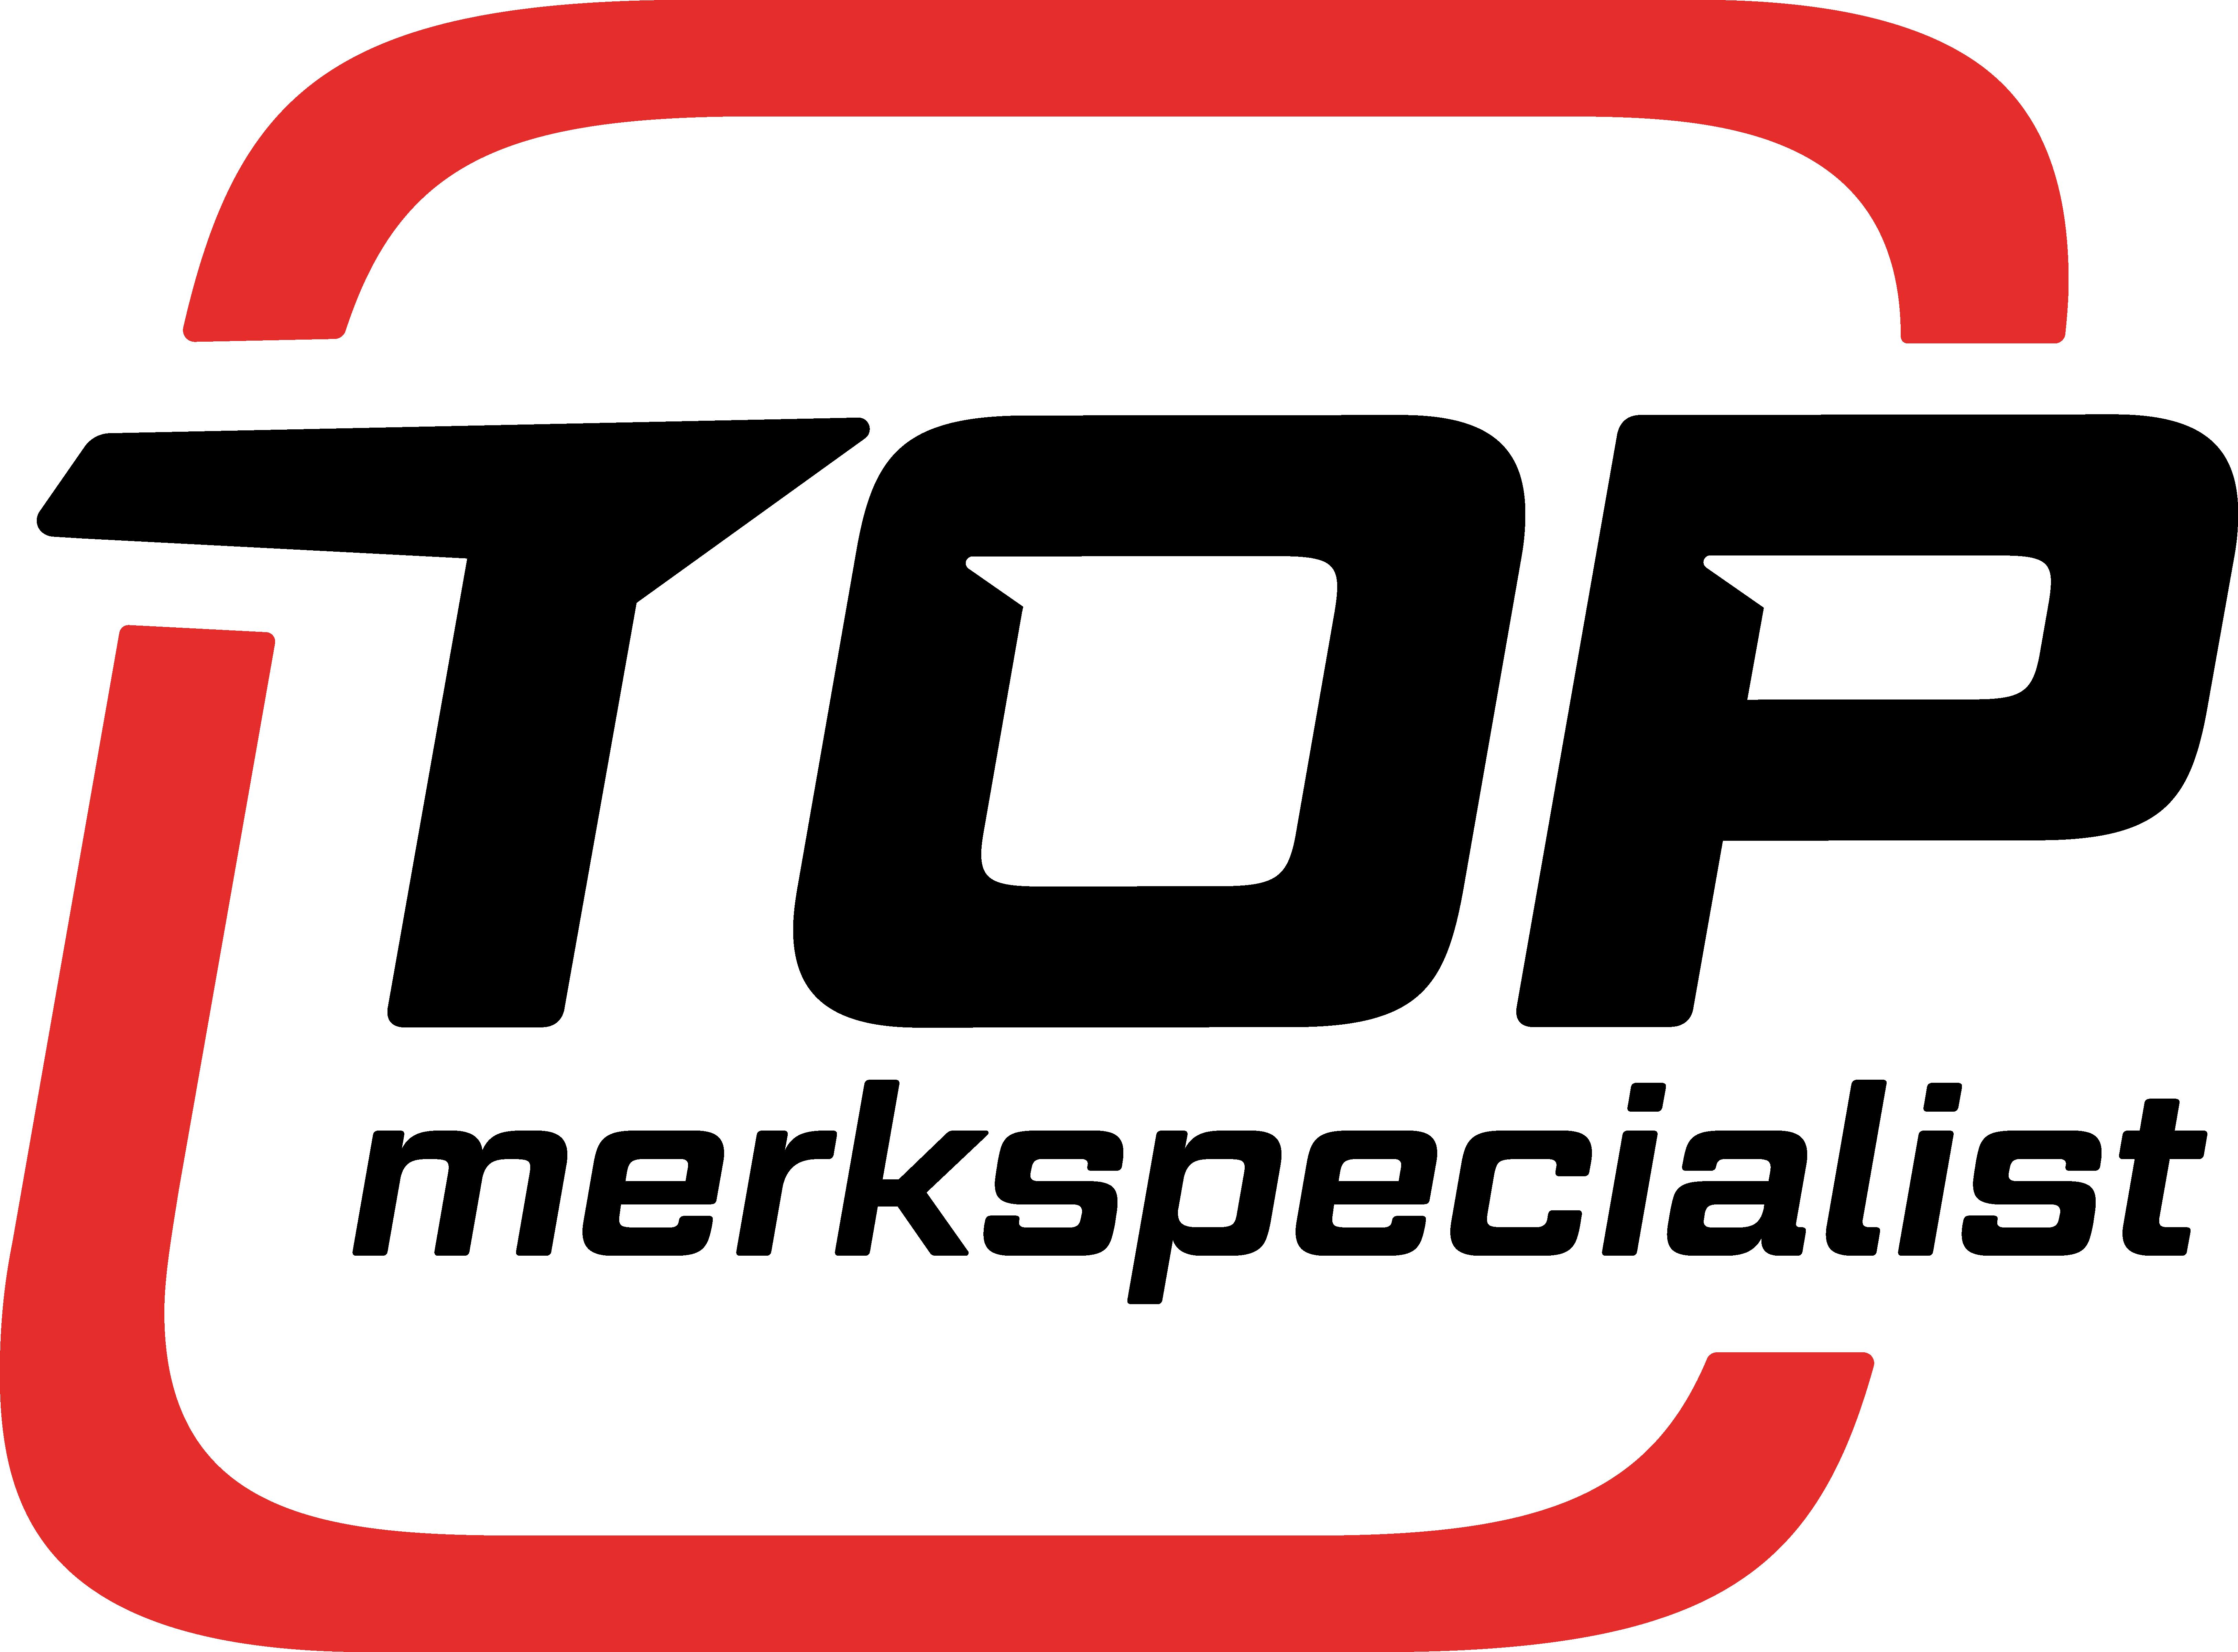 Vetos – merkspecialist in Toyota logo